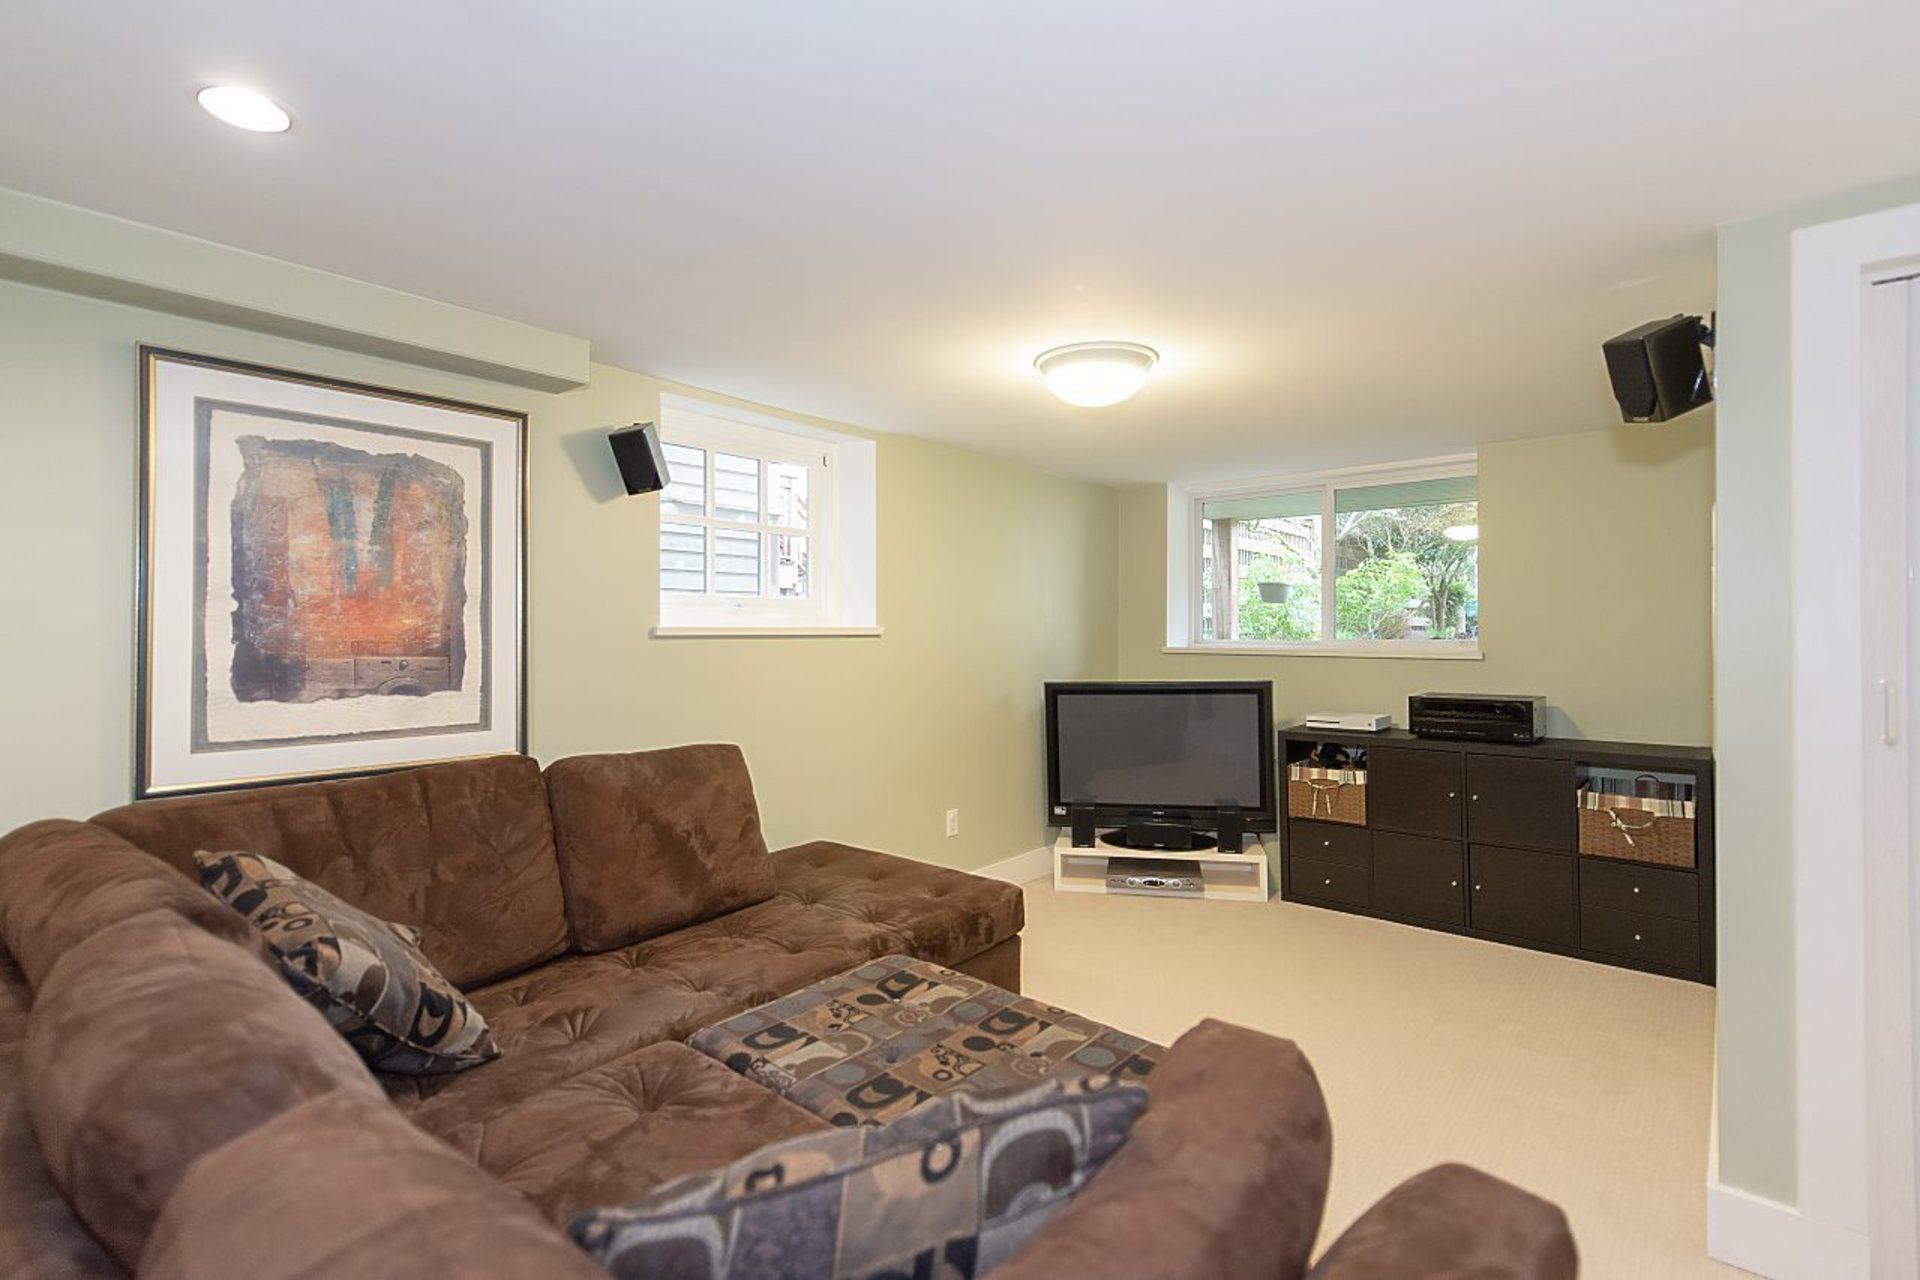 926-e-23rd-avenue-fraser-ve-vancouver-east-15 at 926 E 23rd Avenue, Fraser VE, Vancouver East